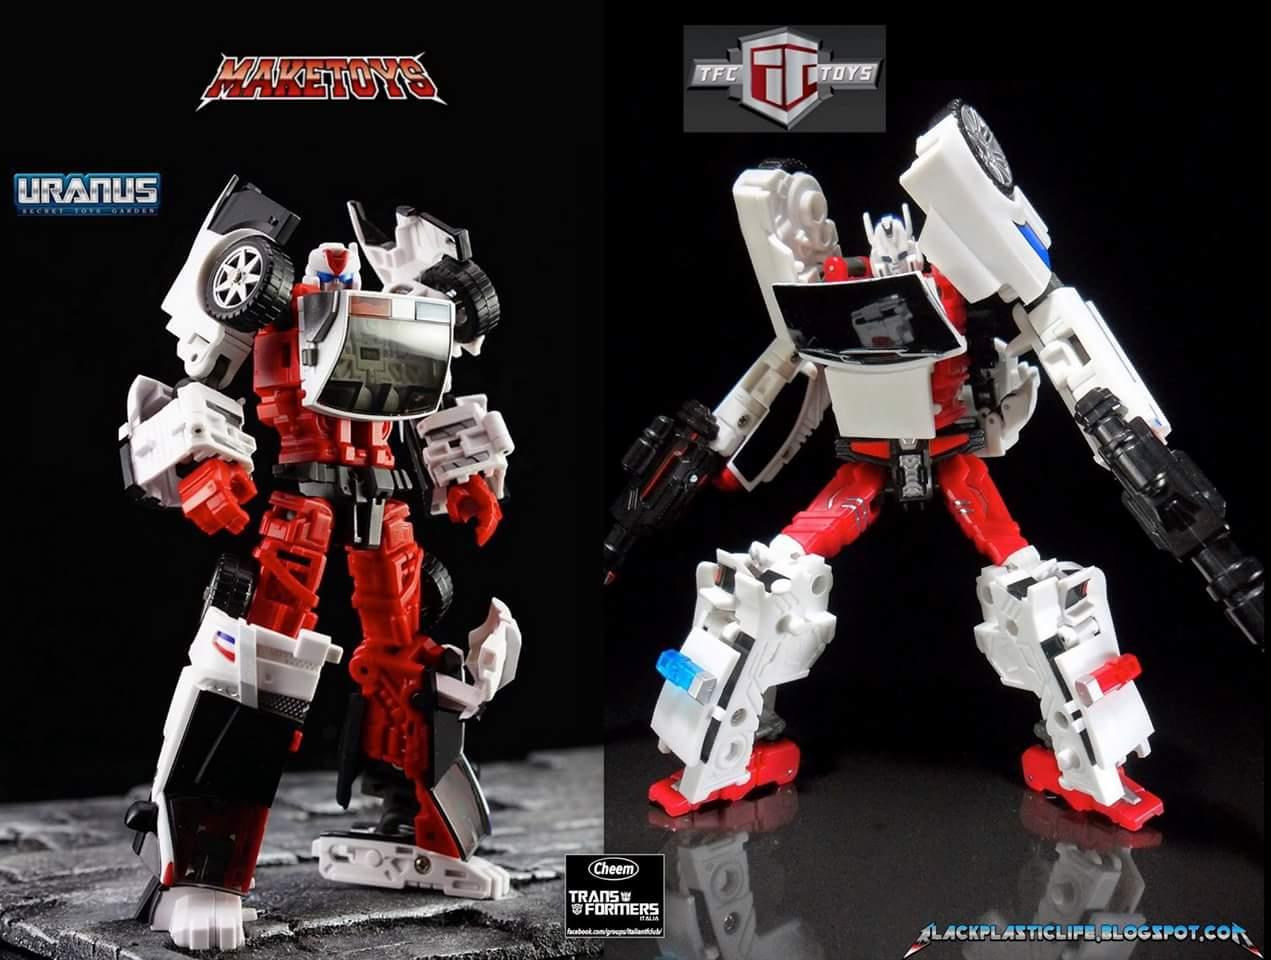 [MakeToys] Produit Tiers - Jouet MTCM-04 Guardia (aka Protectobots - Defensor/Defenso) - Page 2 IIbyt4YY